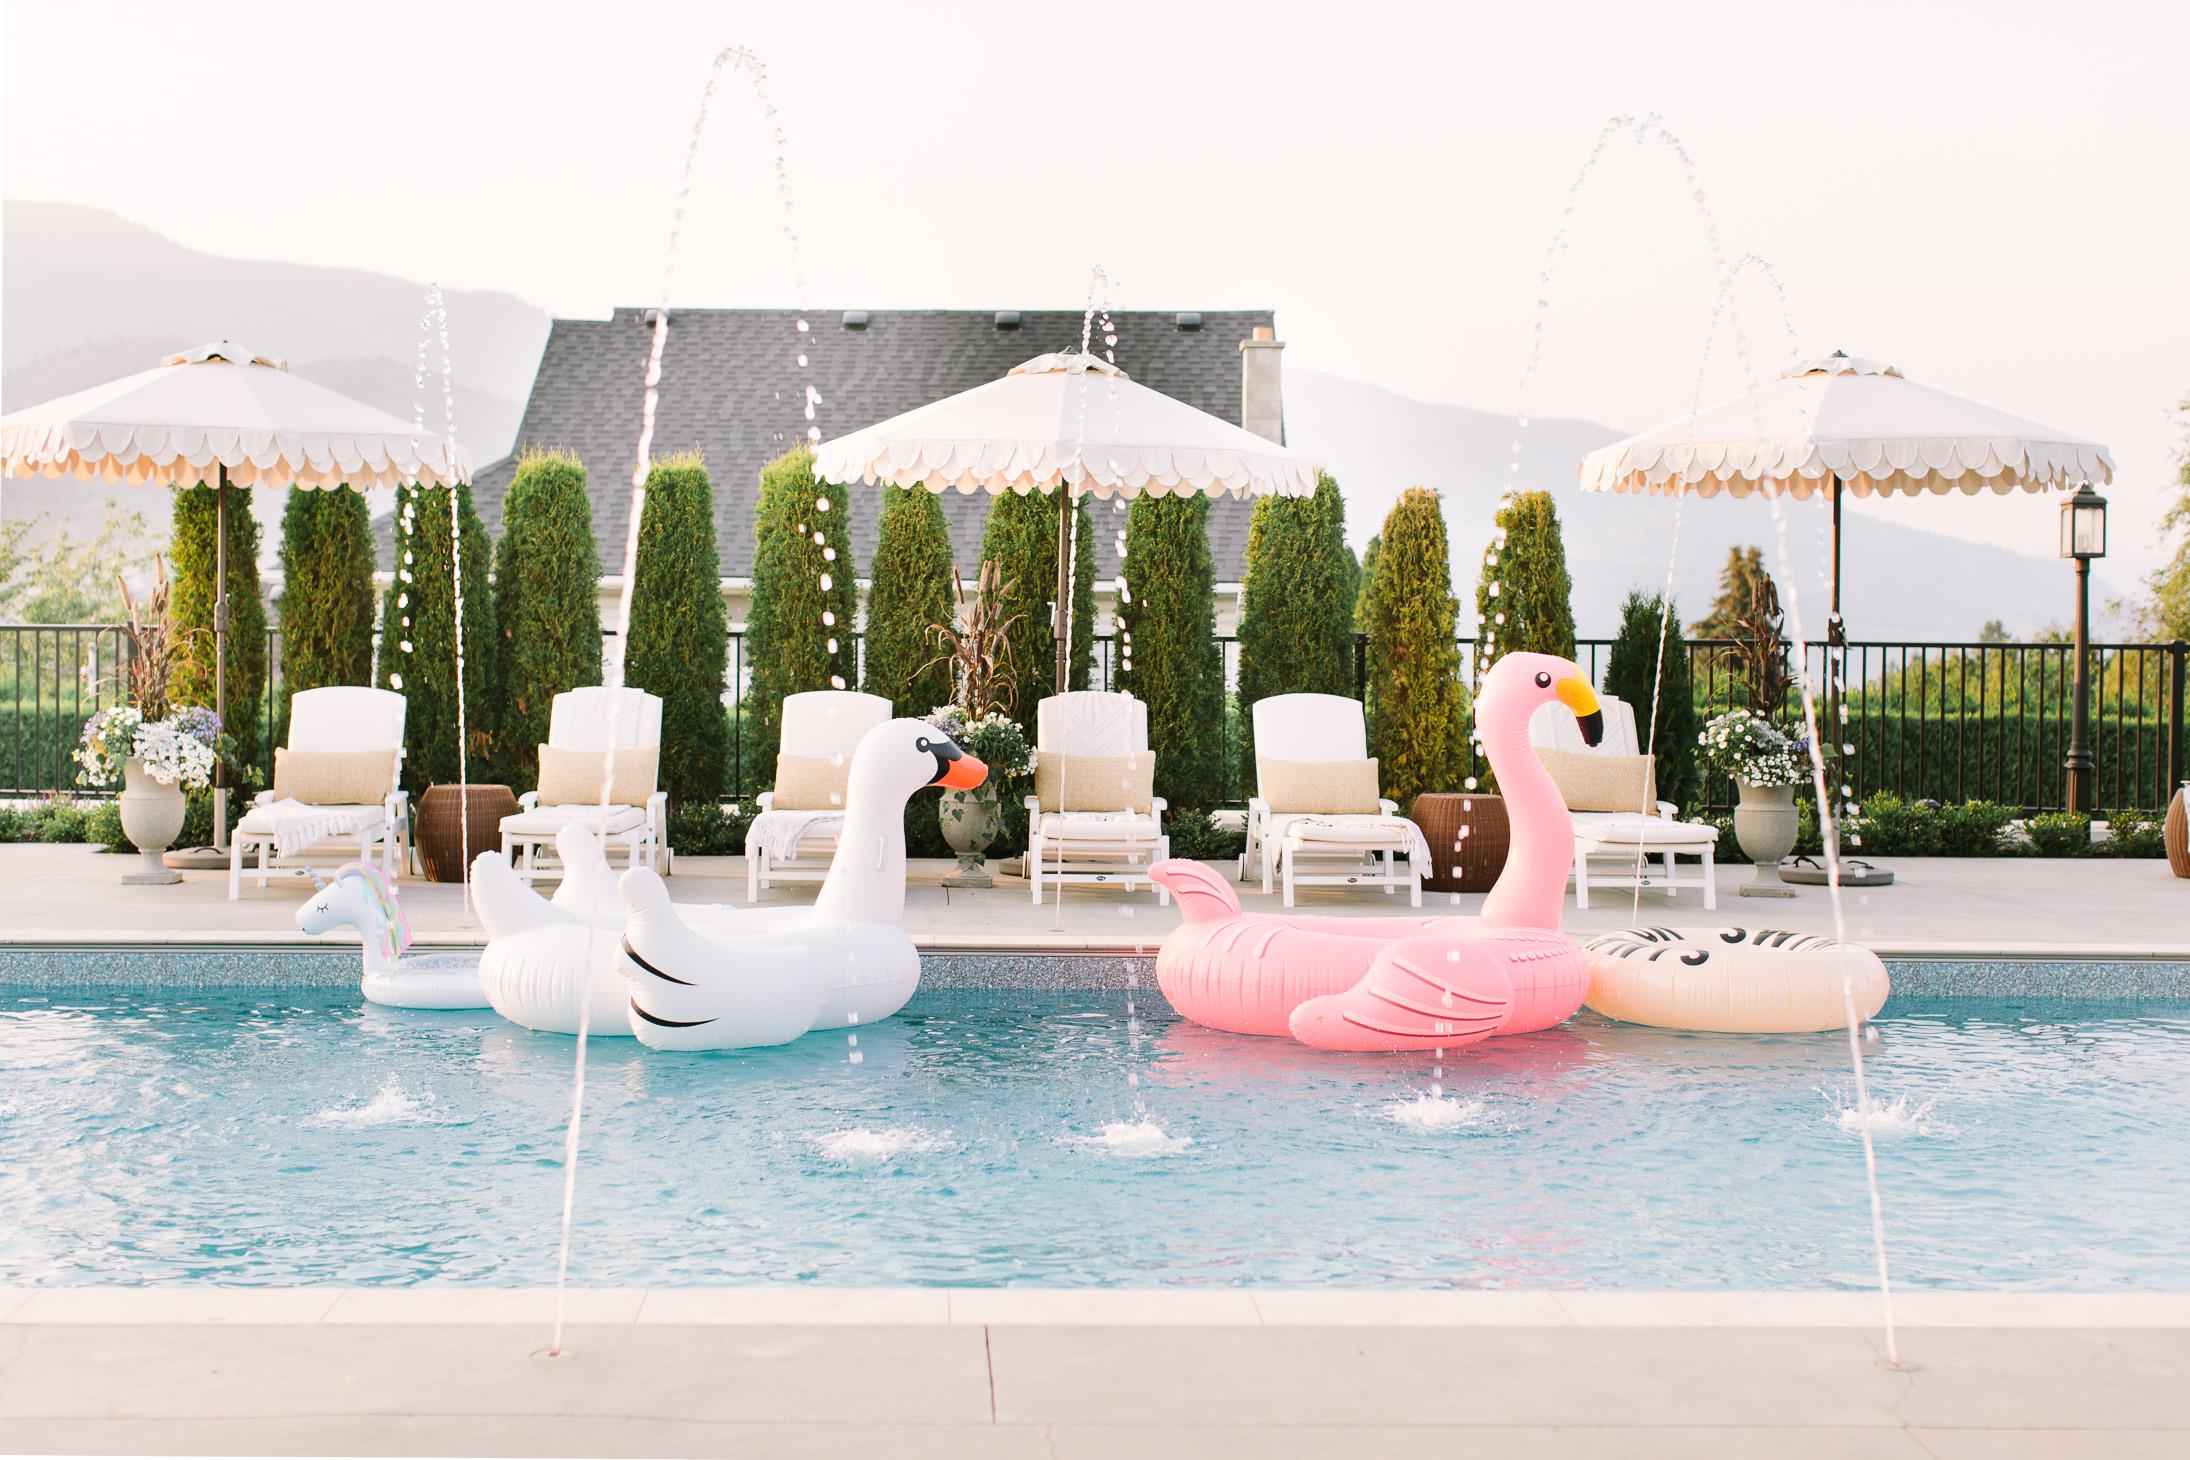 Jillian Harris Summer Sunshine Details on our Pool